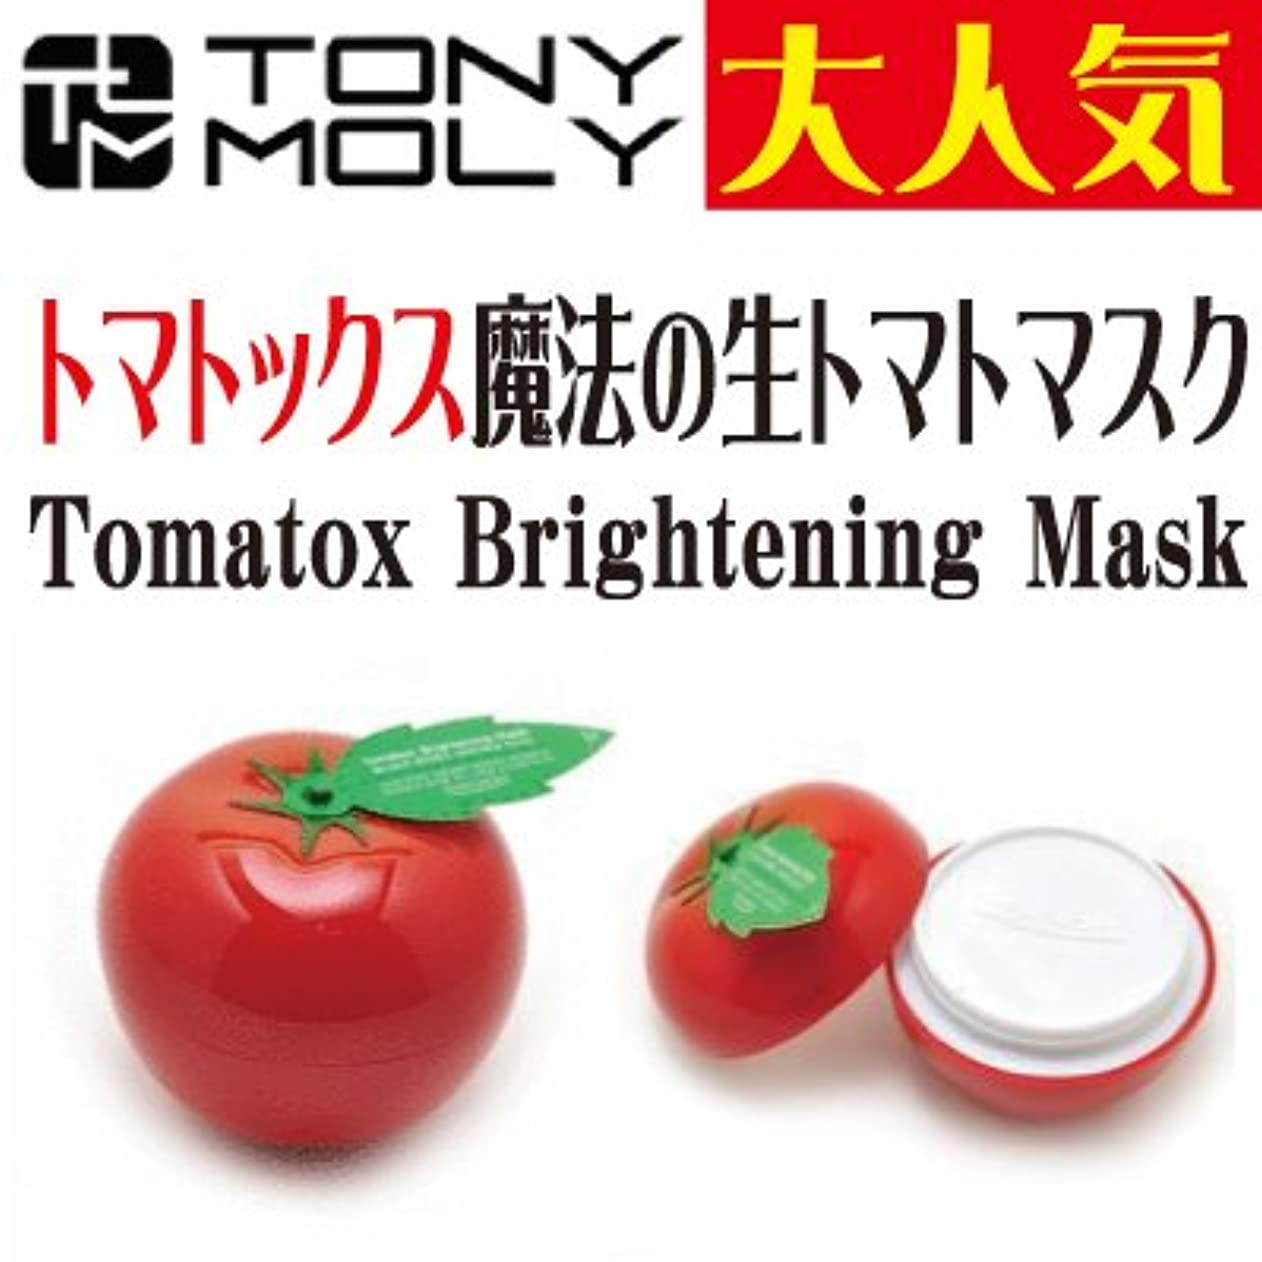 TONYMOLY(トニーモリー)トマトックス ブライトニング マスク